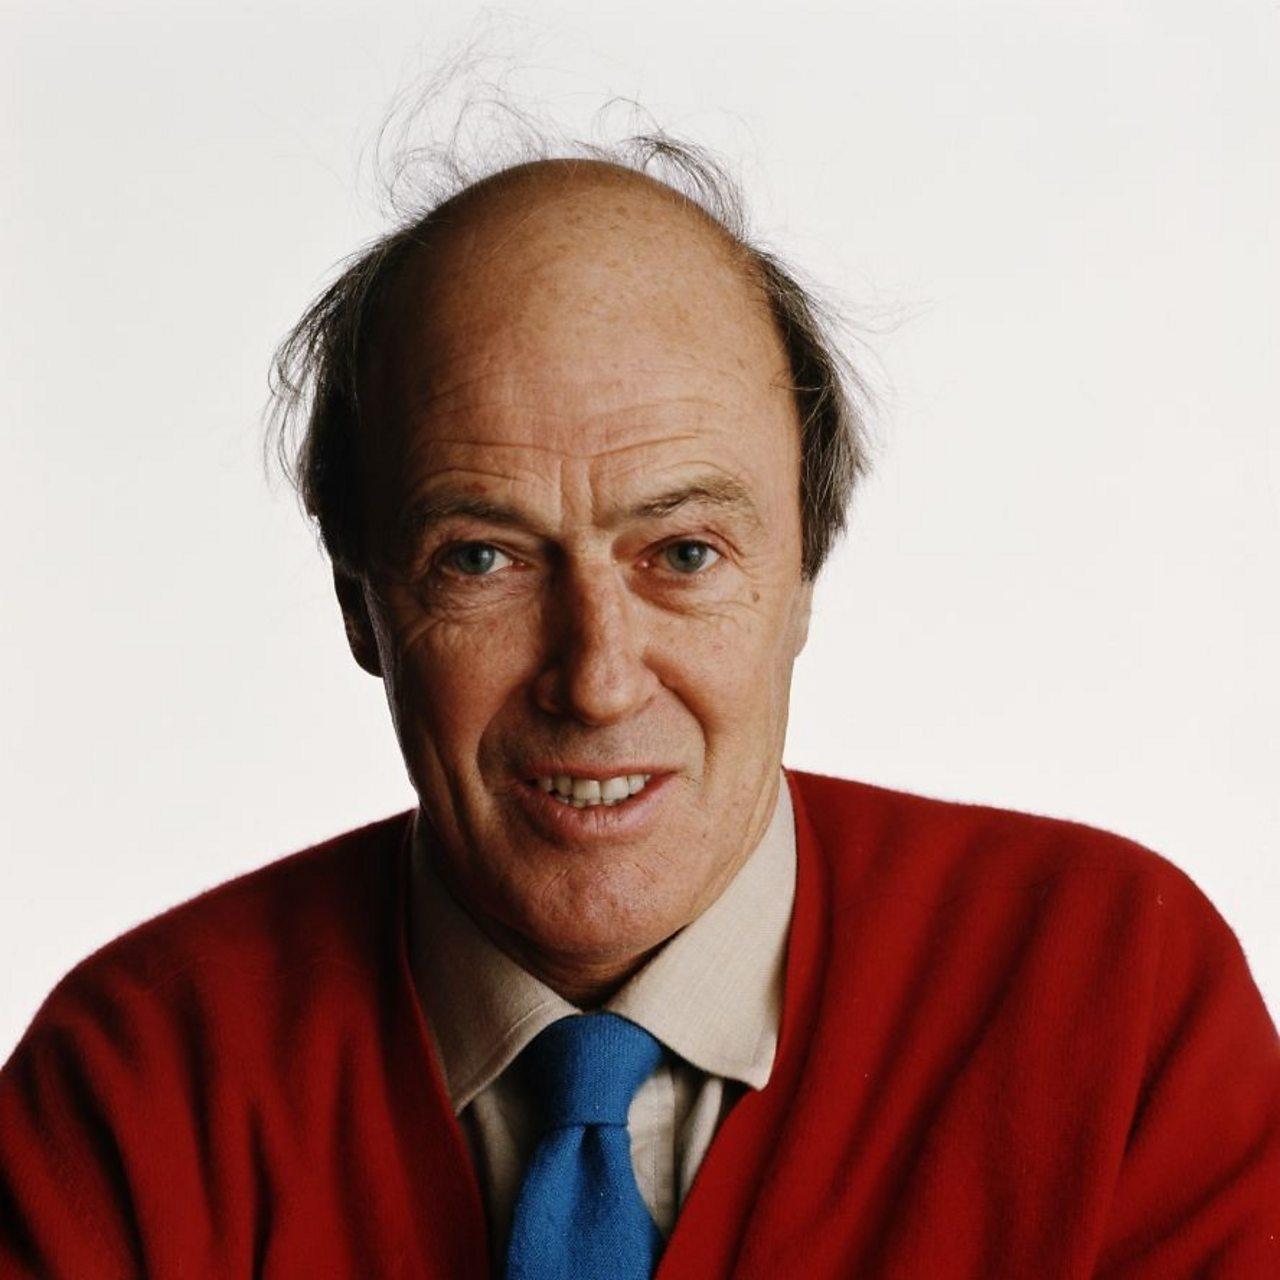 The phizz-whizzing Roald Dahl quiz